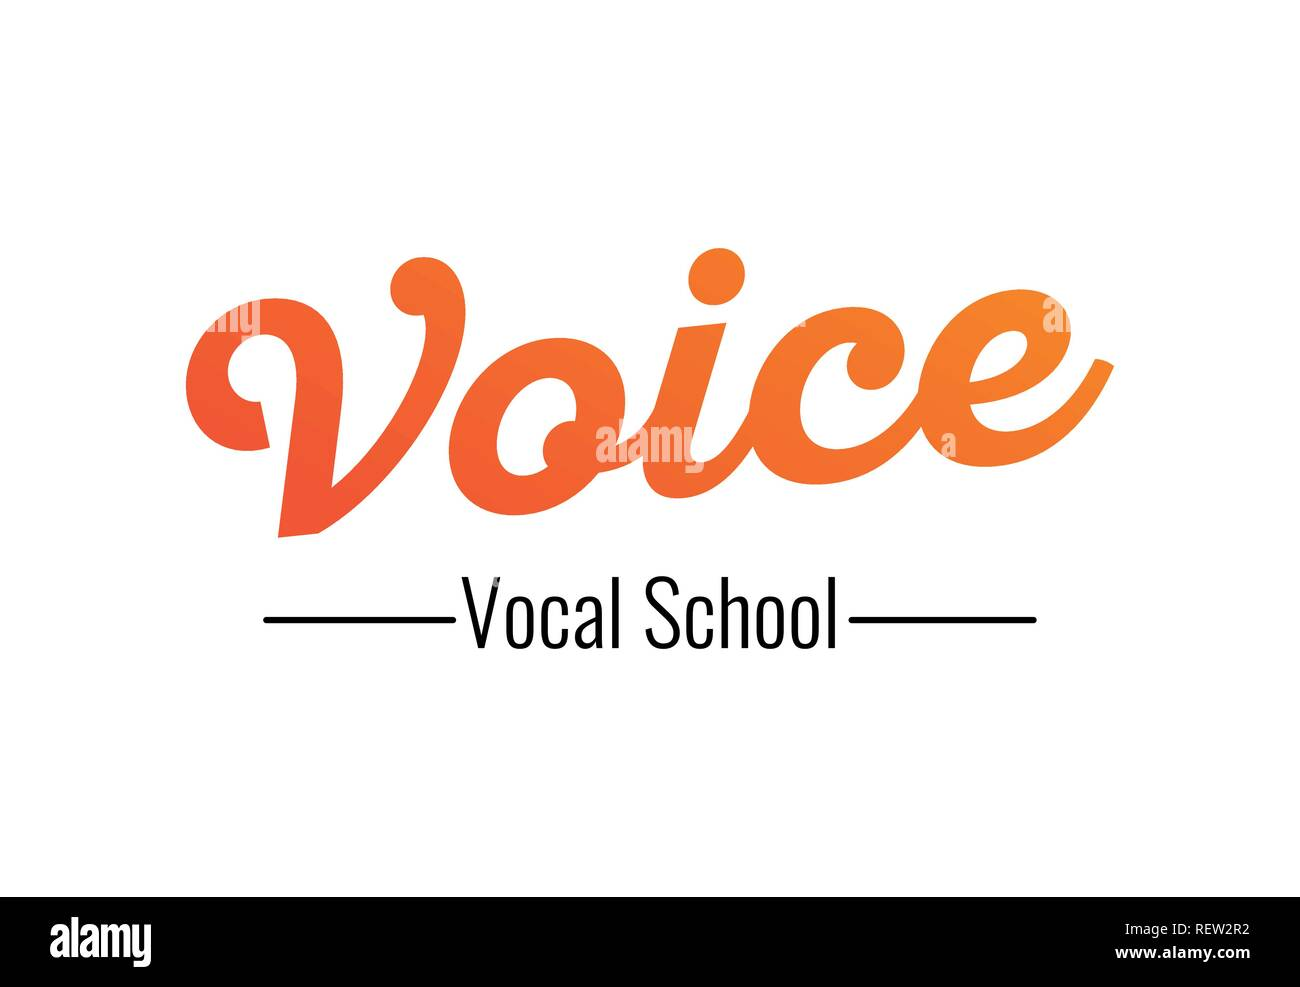 Voice - logo for Vocal School, vector illustration on white transparent background. - Stock Image